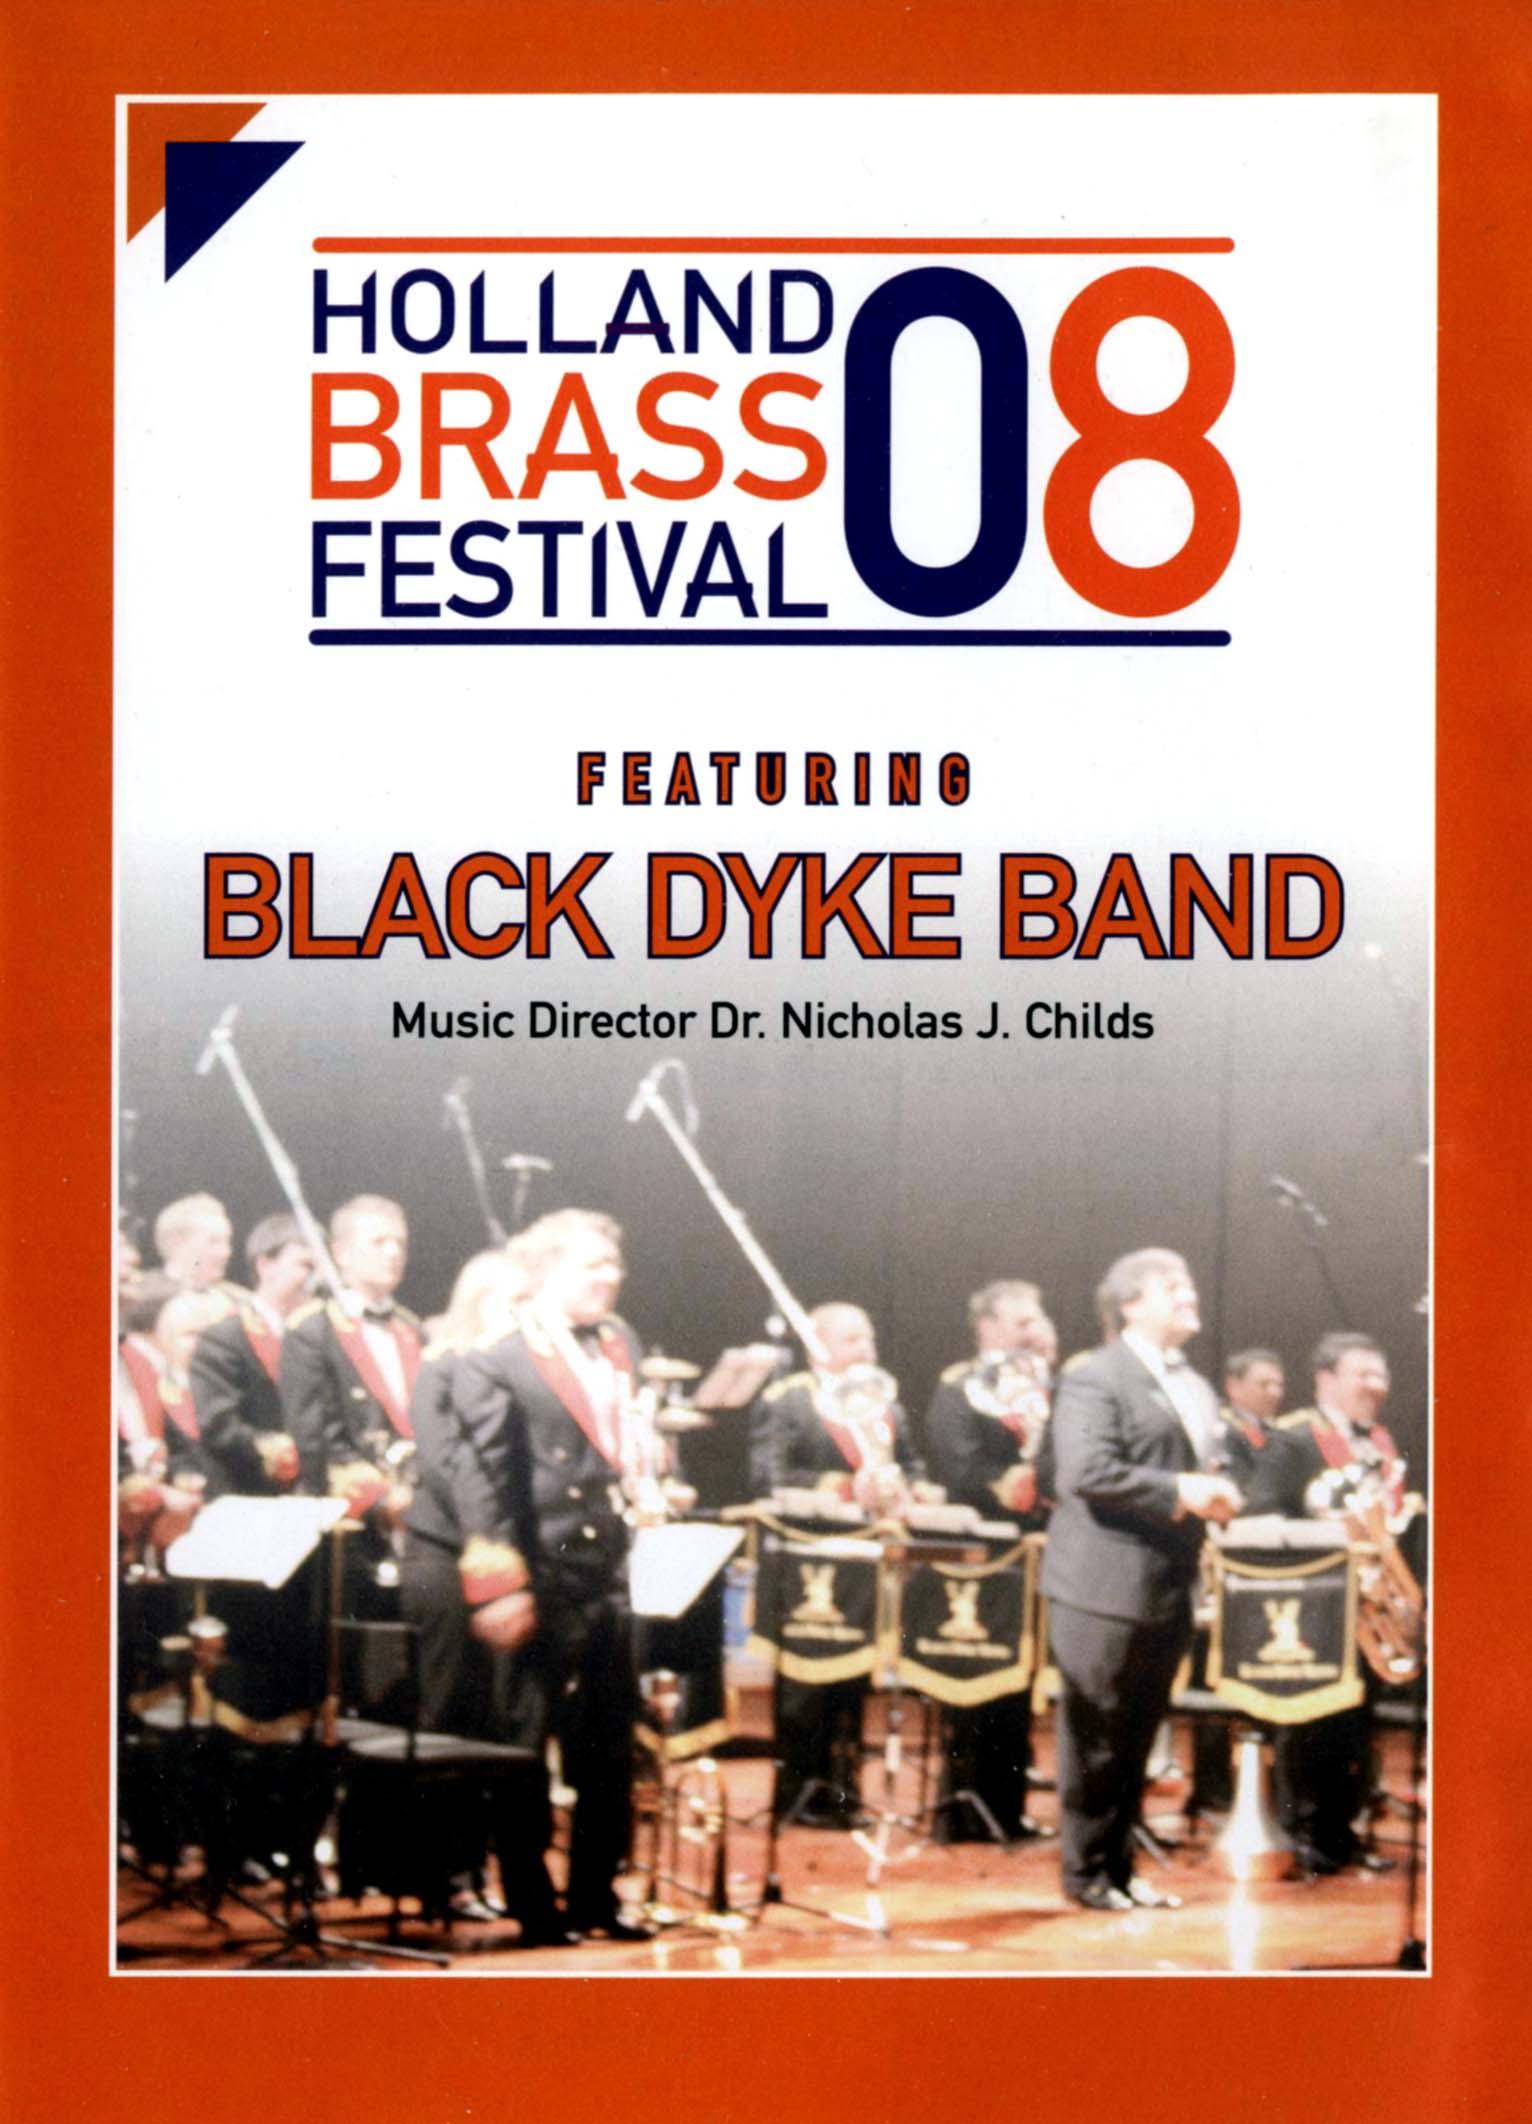 Holland Brass Festival 2008 Featuring Black Dyke Band